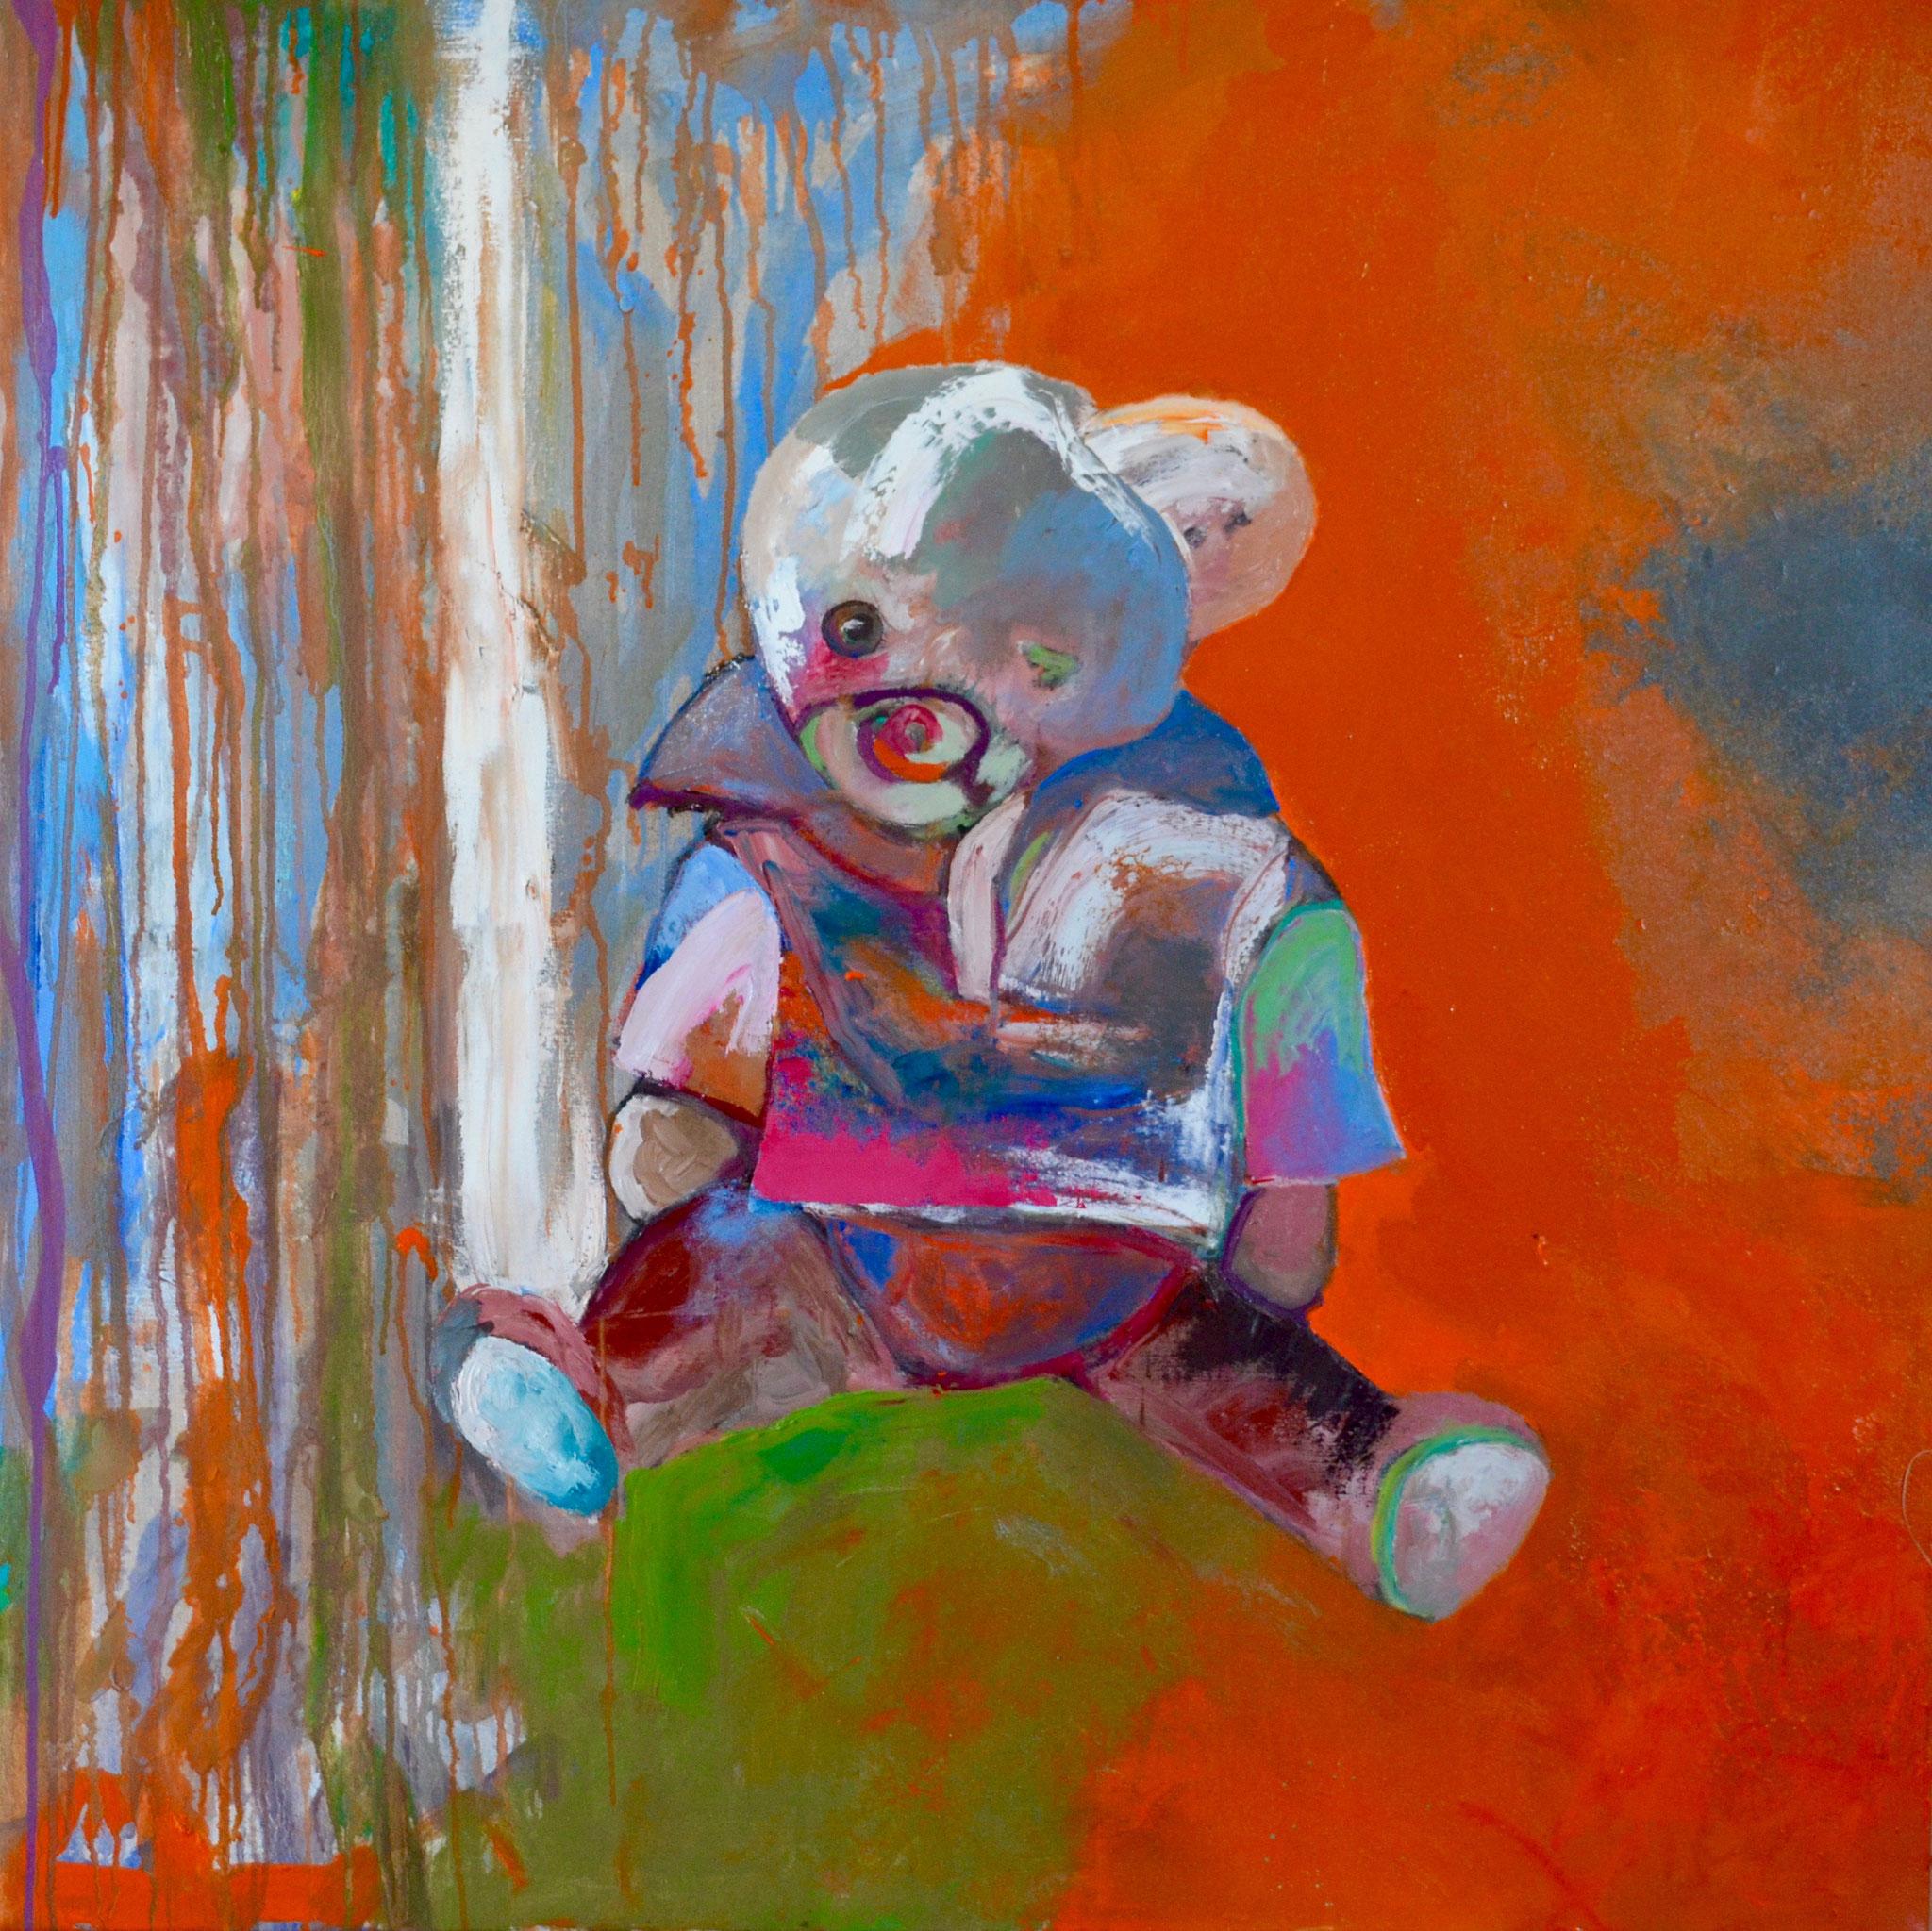 33 - Toile/canvas - 100 x 100 cm